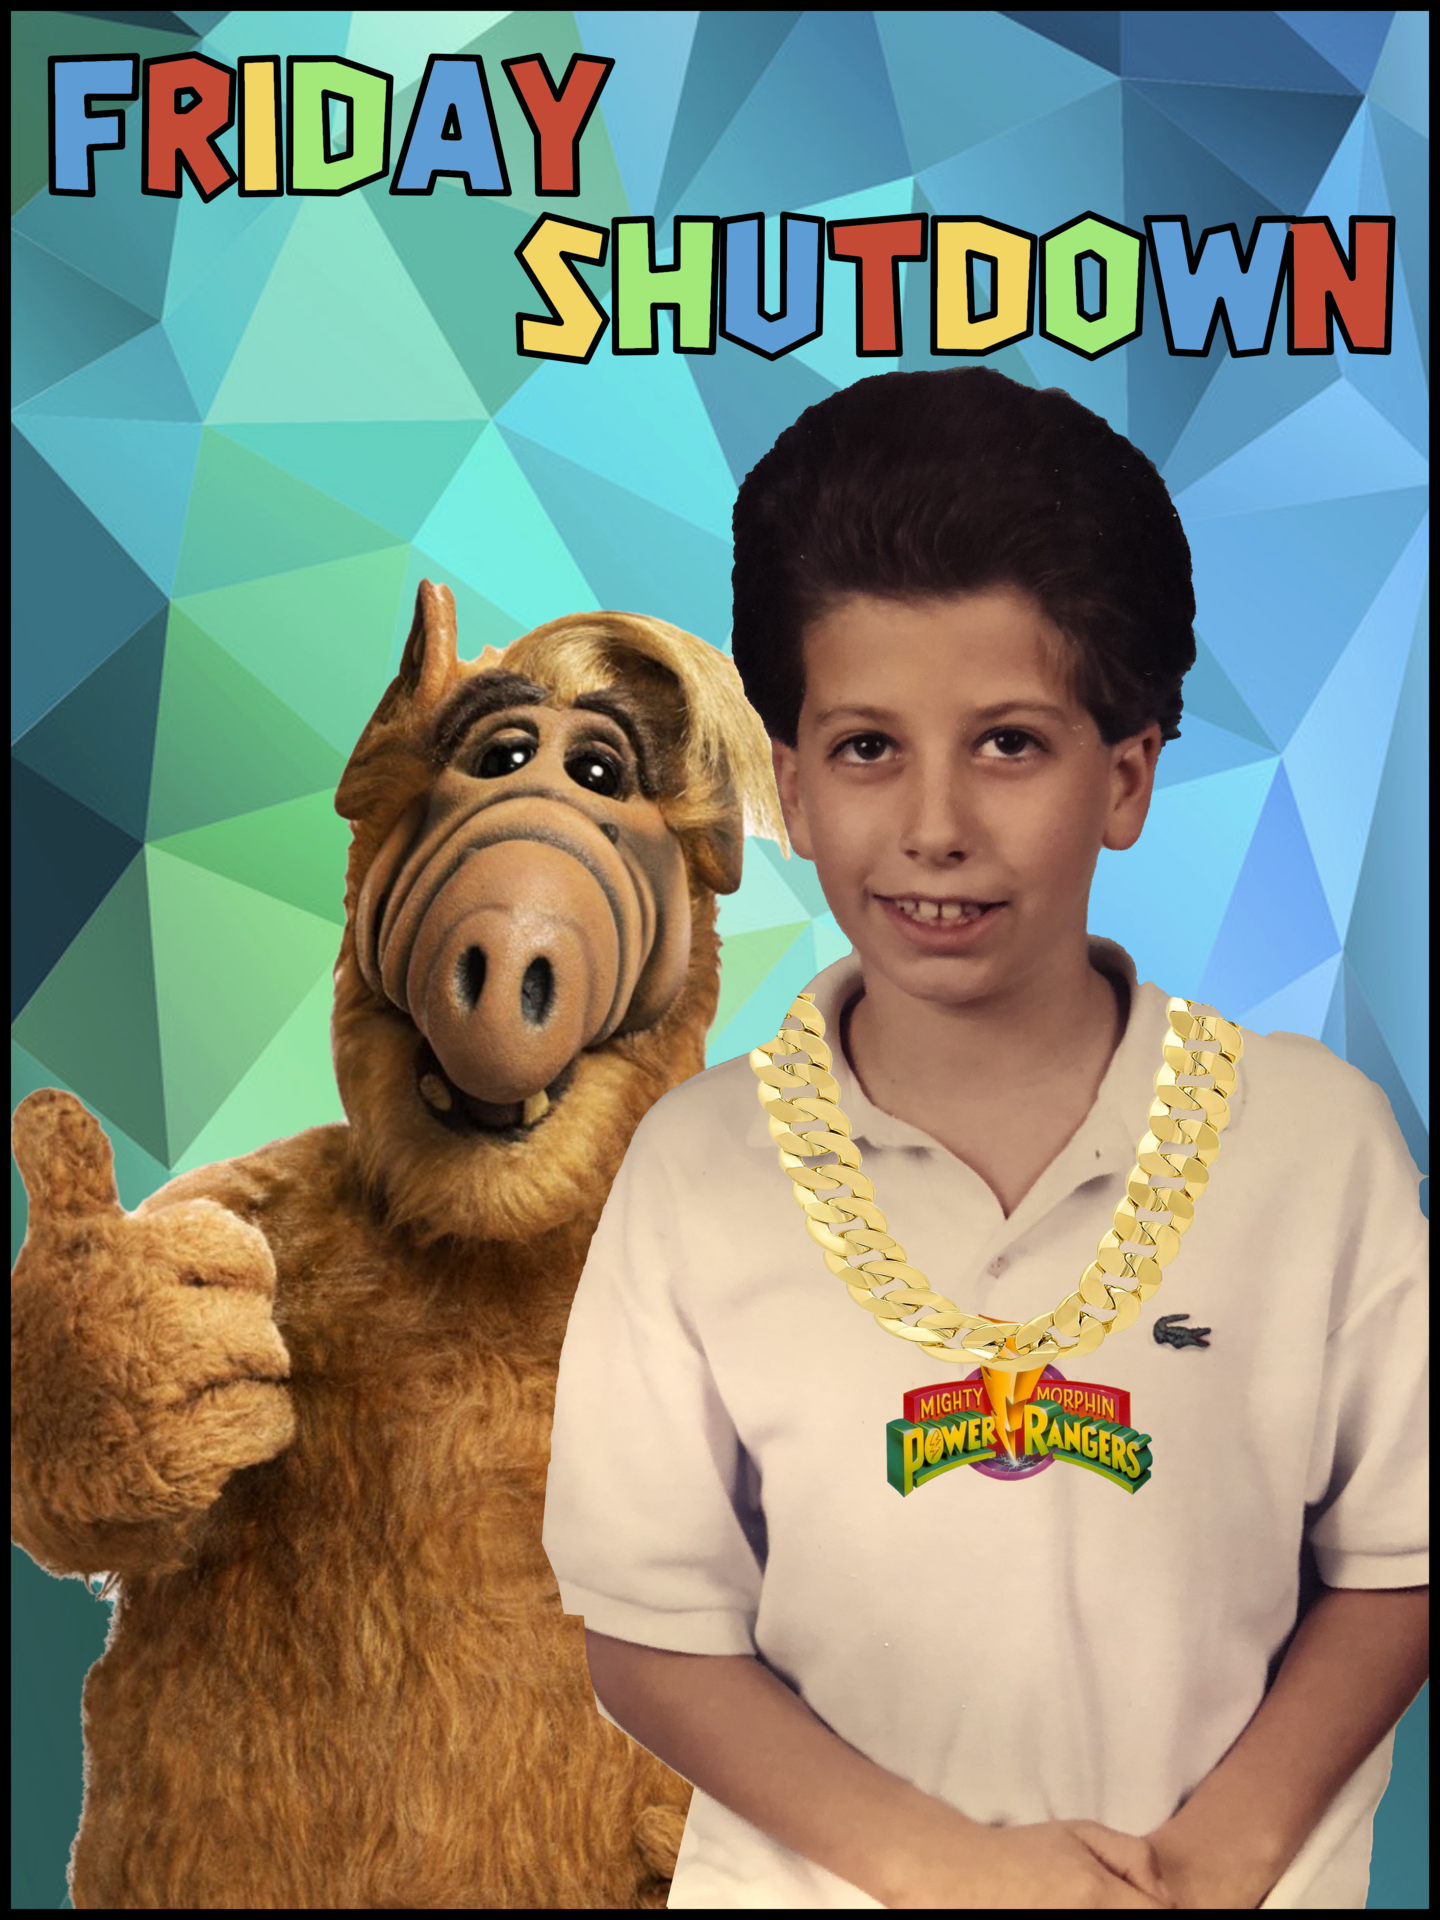 FridayShutdown